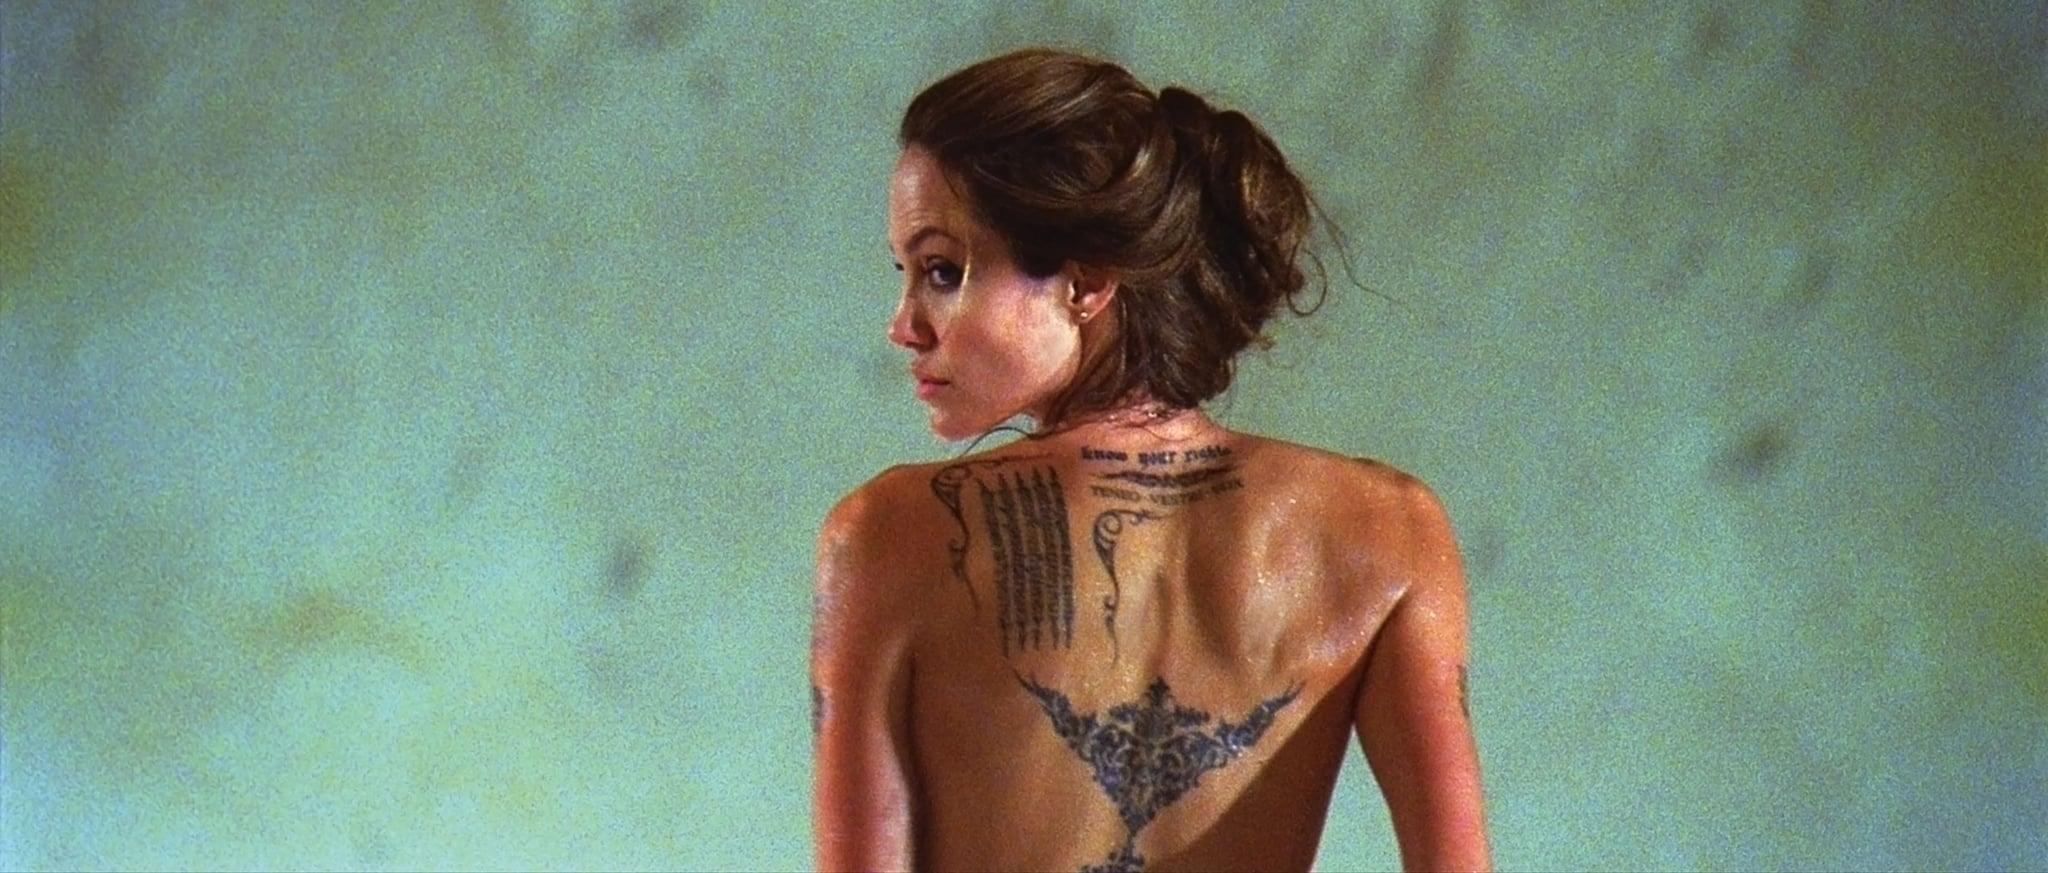 Angelina Jolie Hot Stills celebrity & entertainment | look back at angelina jolie's